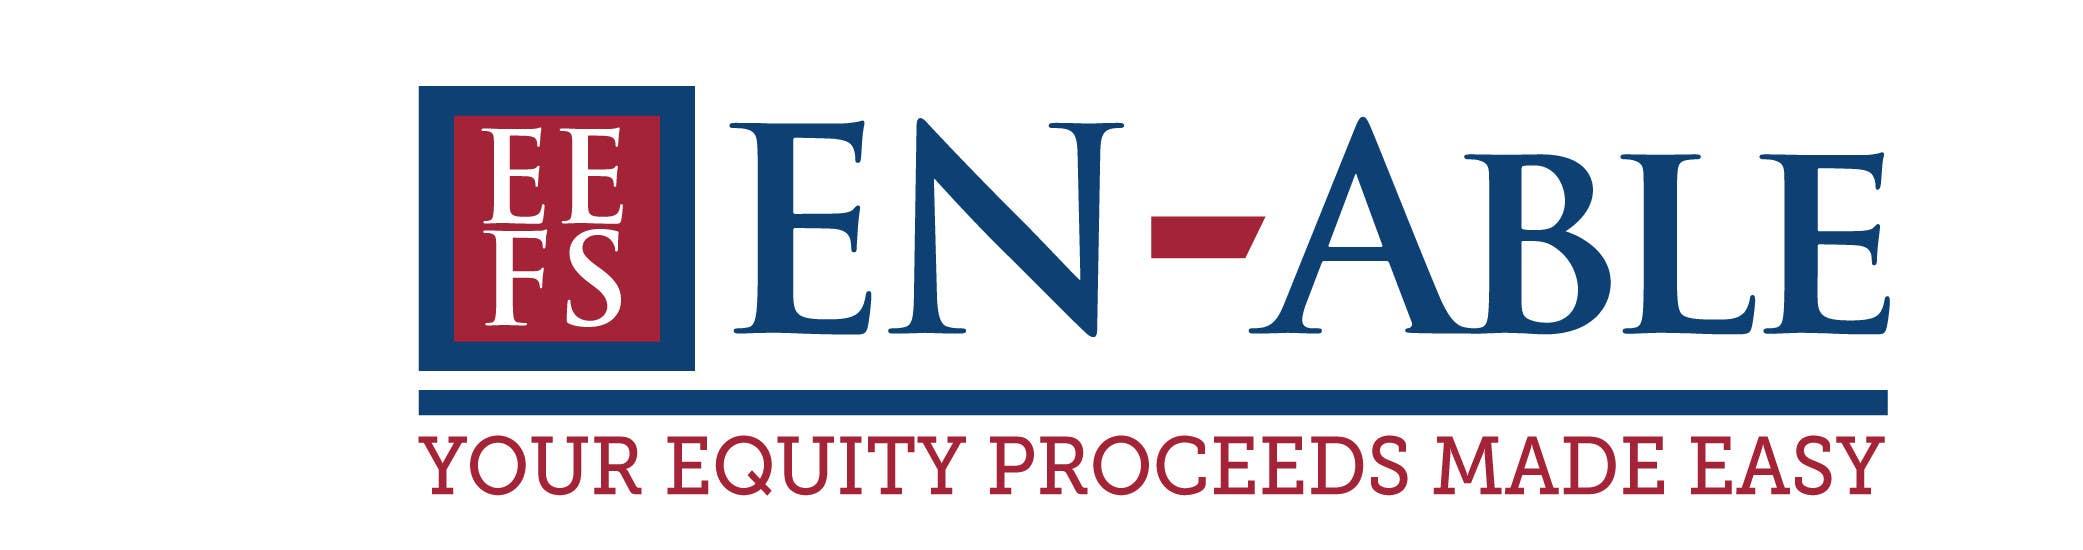 Penyertaan Peraduan #                                        60                                      untuk                                         Design a Logo for EN-Able Equity Funding Solutions (Pty) Ltd